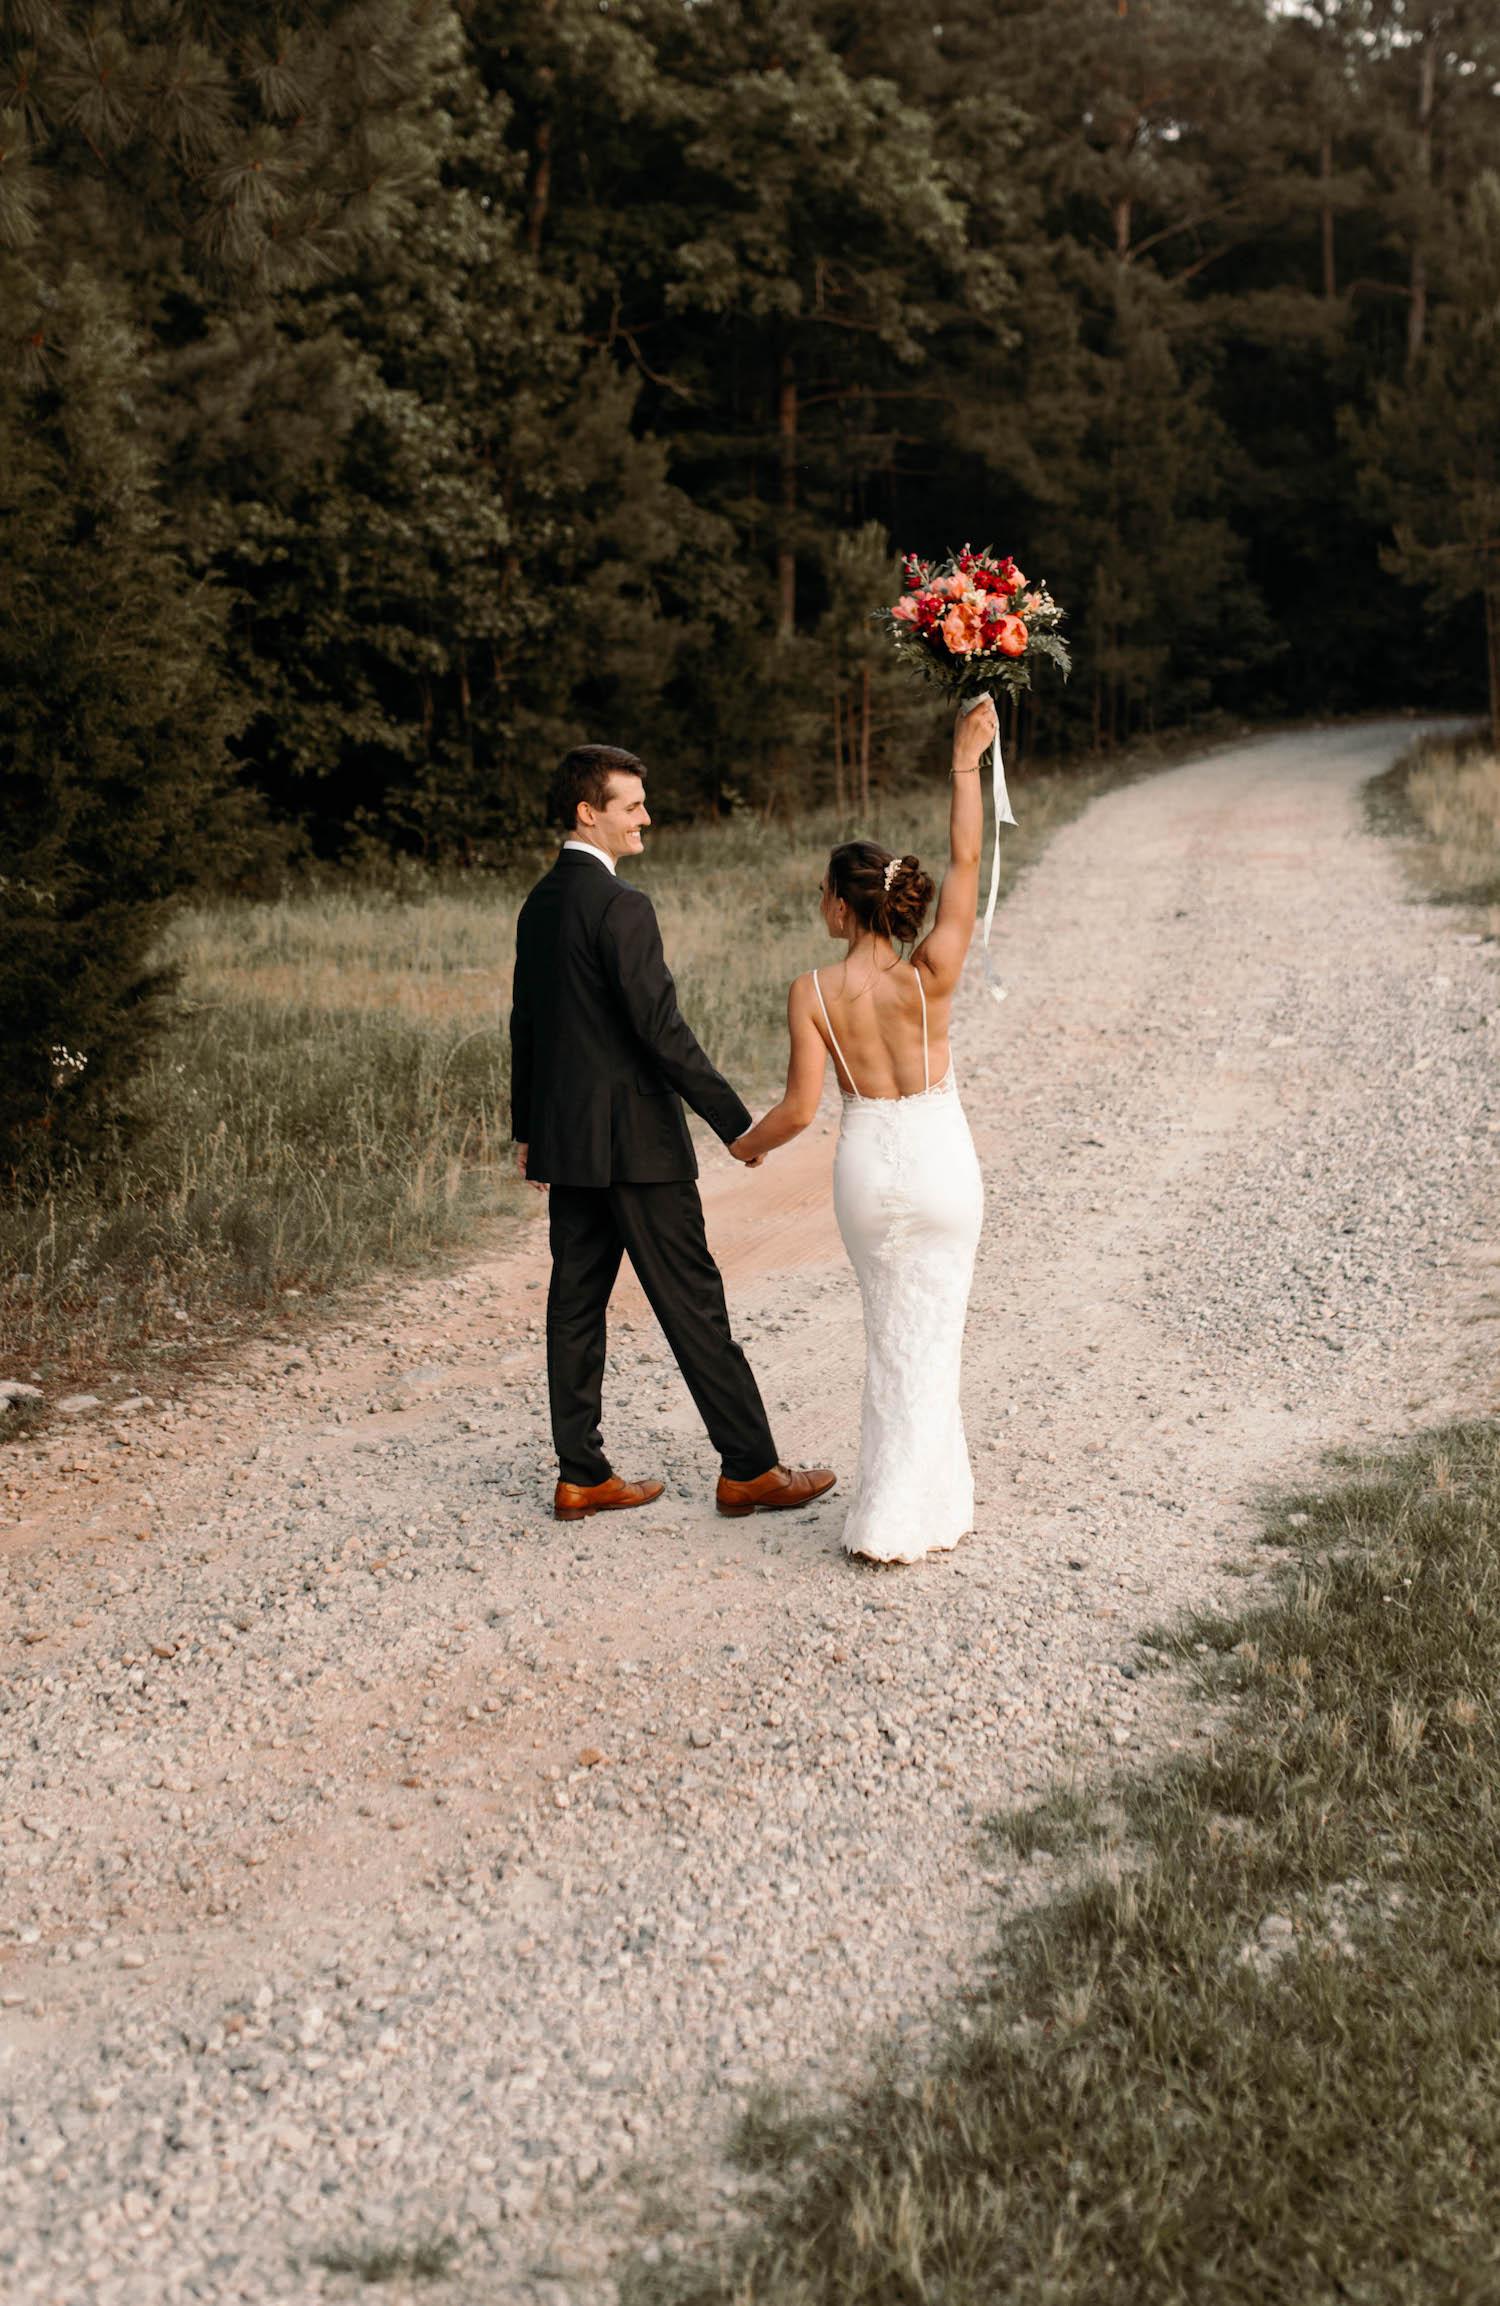 Just-Married-Photo-Ideas473.jpg